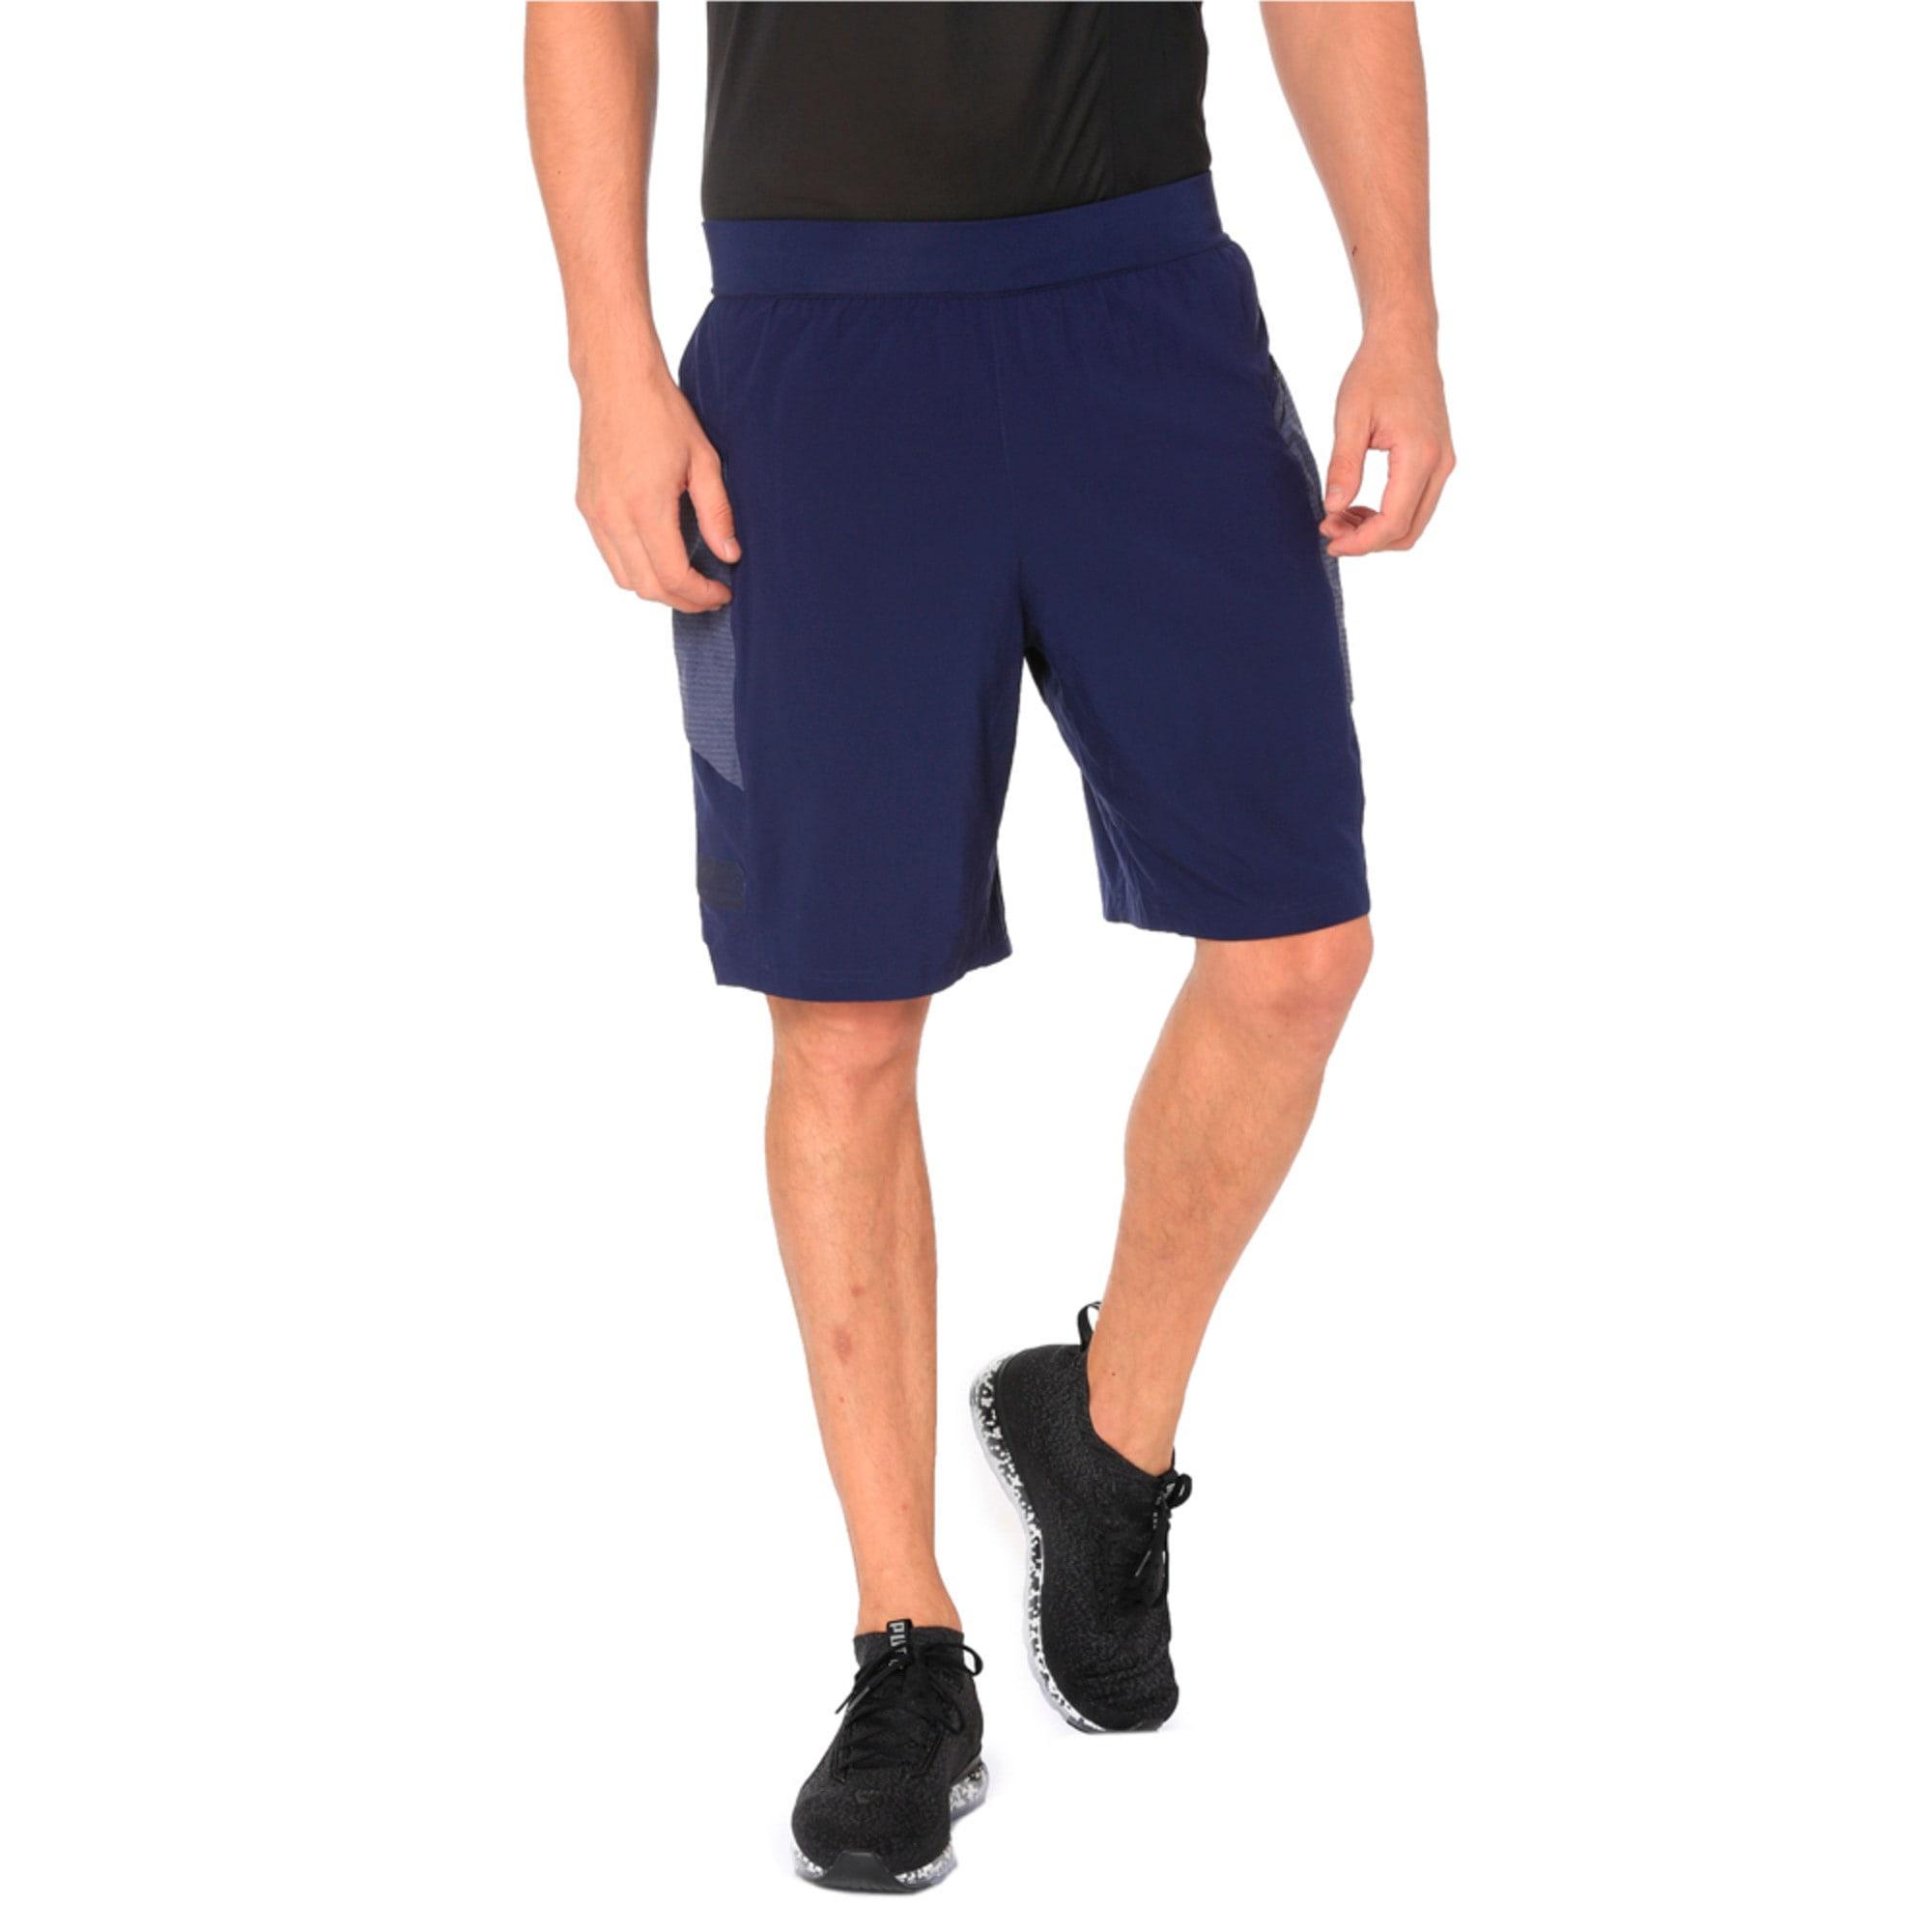 Thumbnail 2 of NeverRunBack 9'' Men's Training Shorts, Peacoat, medium-IND